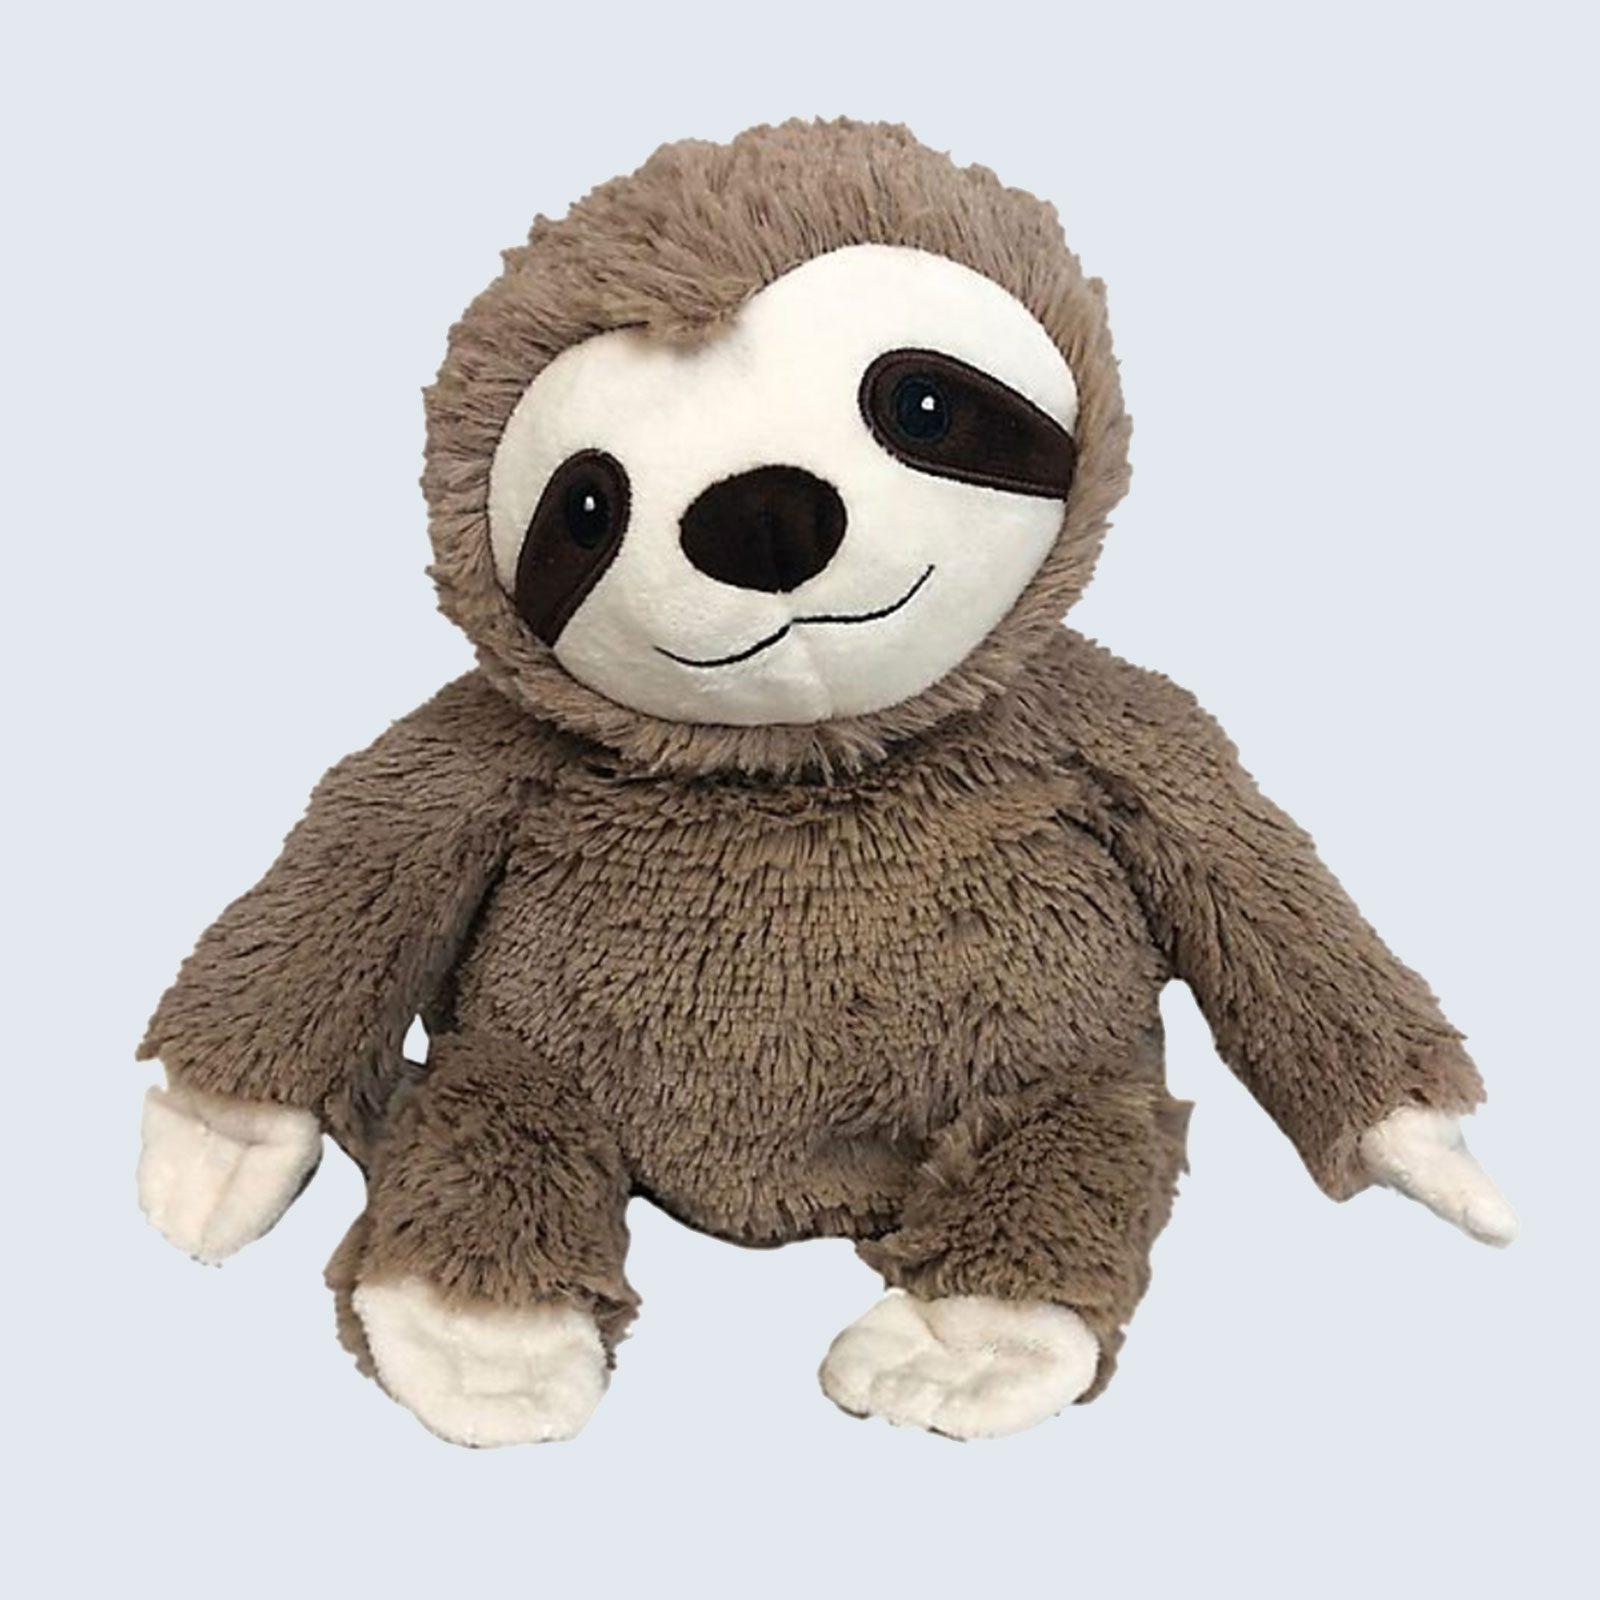 Warmies Plush Sloth